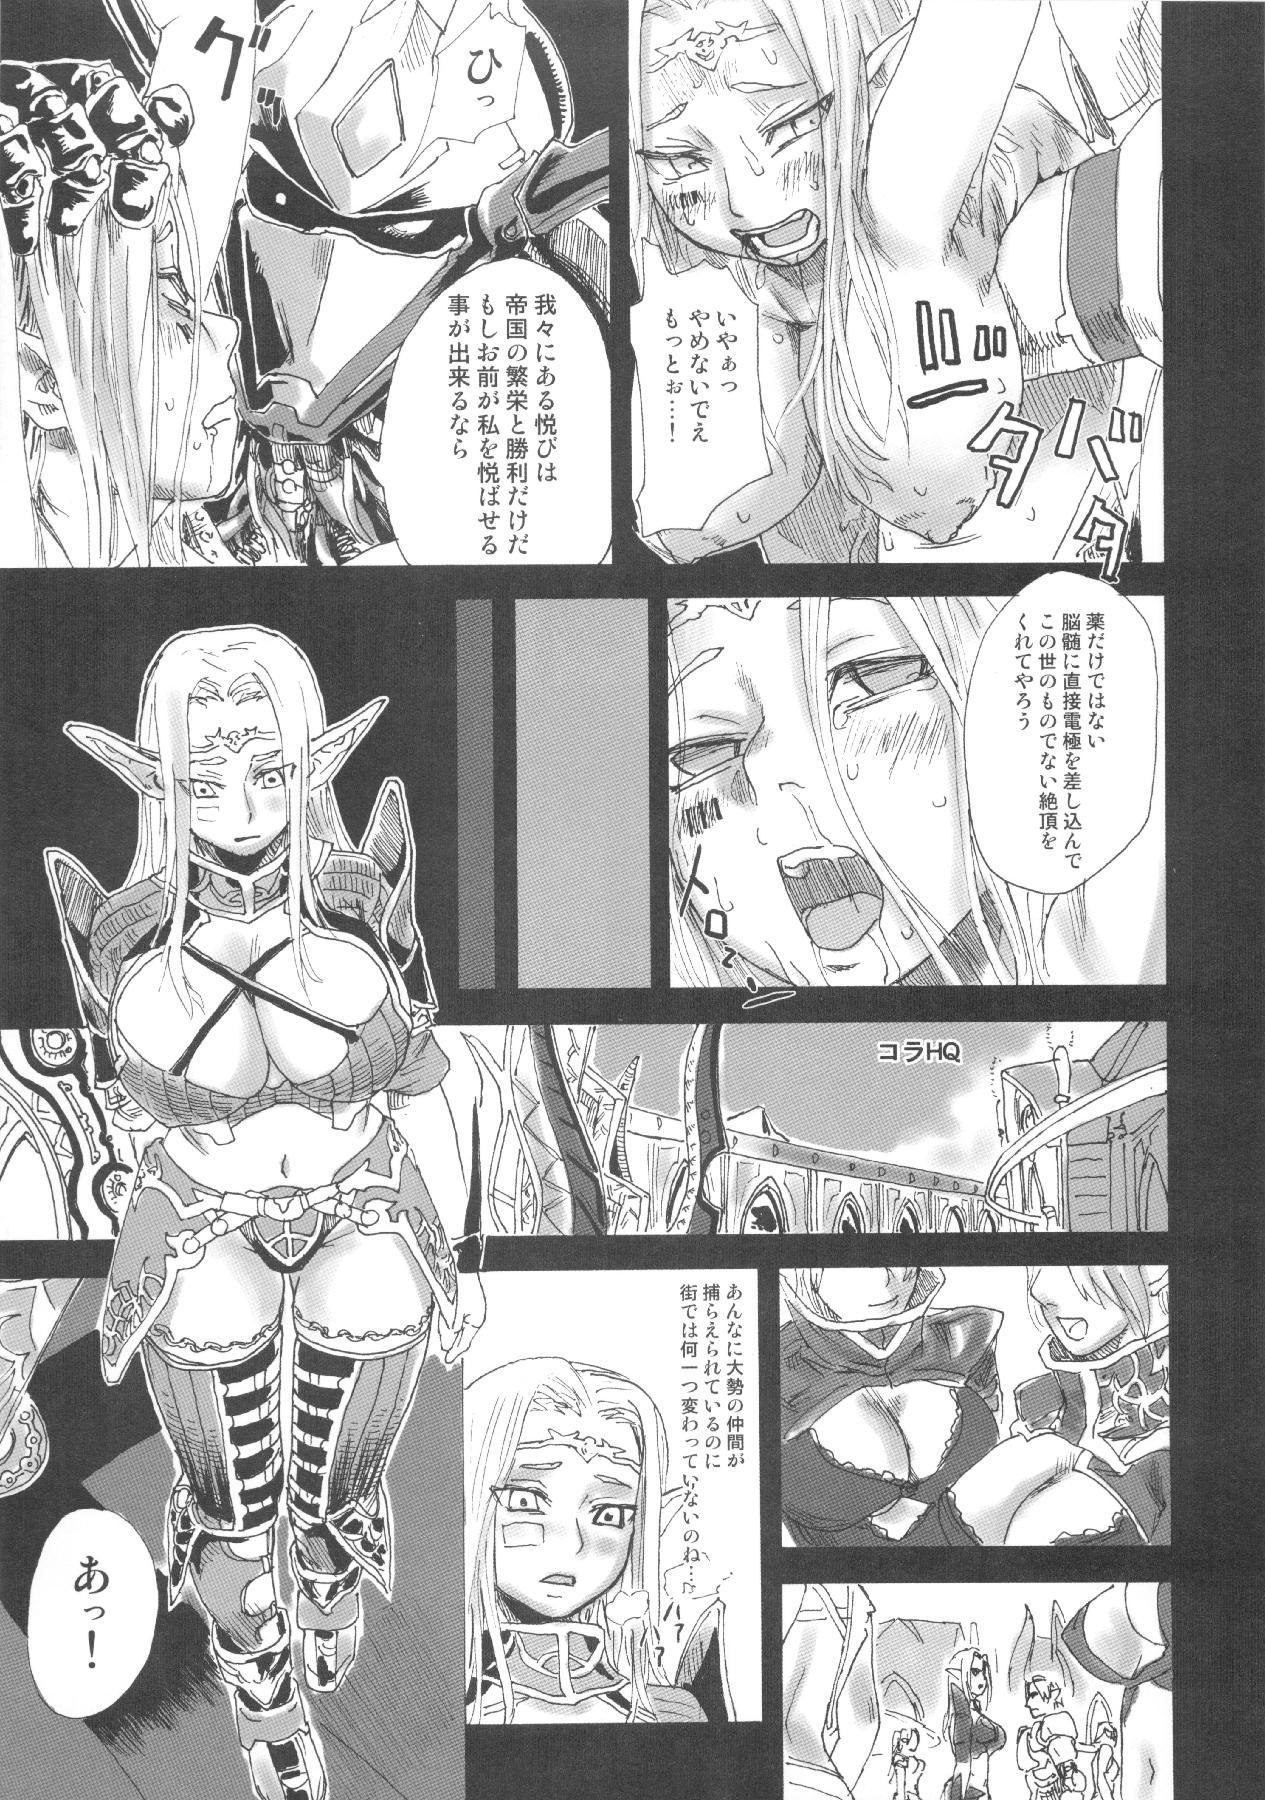 (C83) [Fatalpulse (Asanagi)] VictimGirls Compiled Vol.1 -Victimgirls Soushuuhen 1- MMO Game Selection (Various) 111